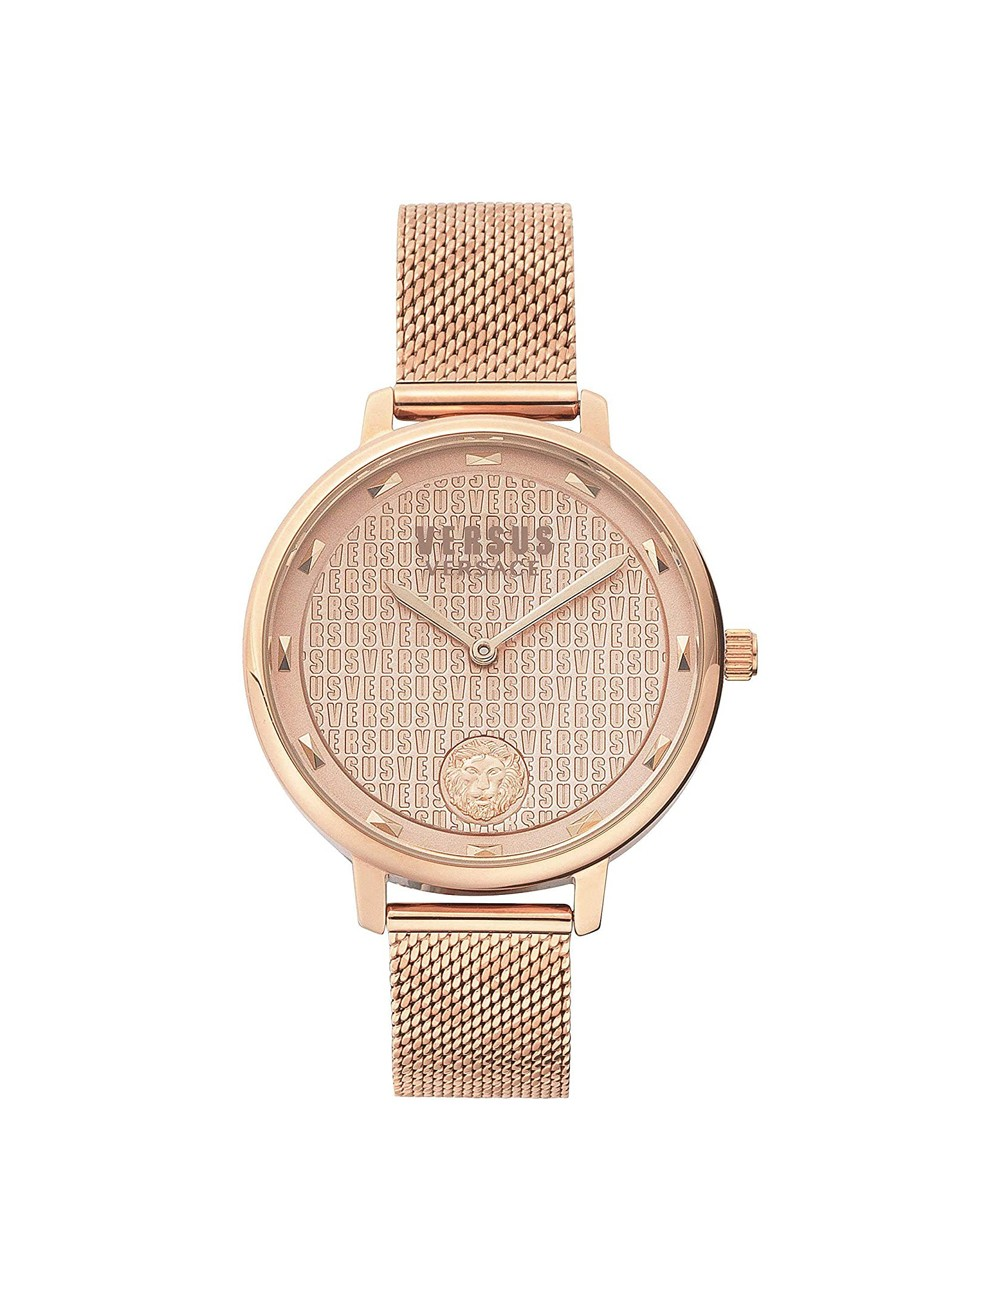 Versus VSP1S1620 Lavillette Ladies Watch